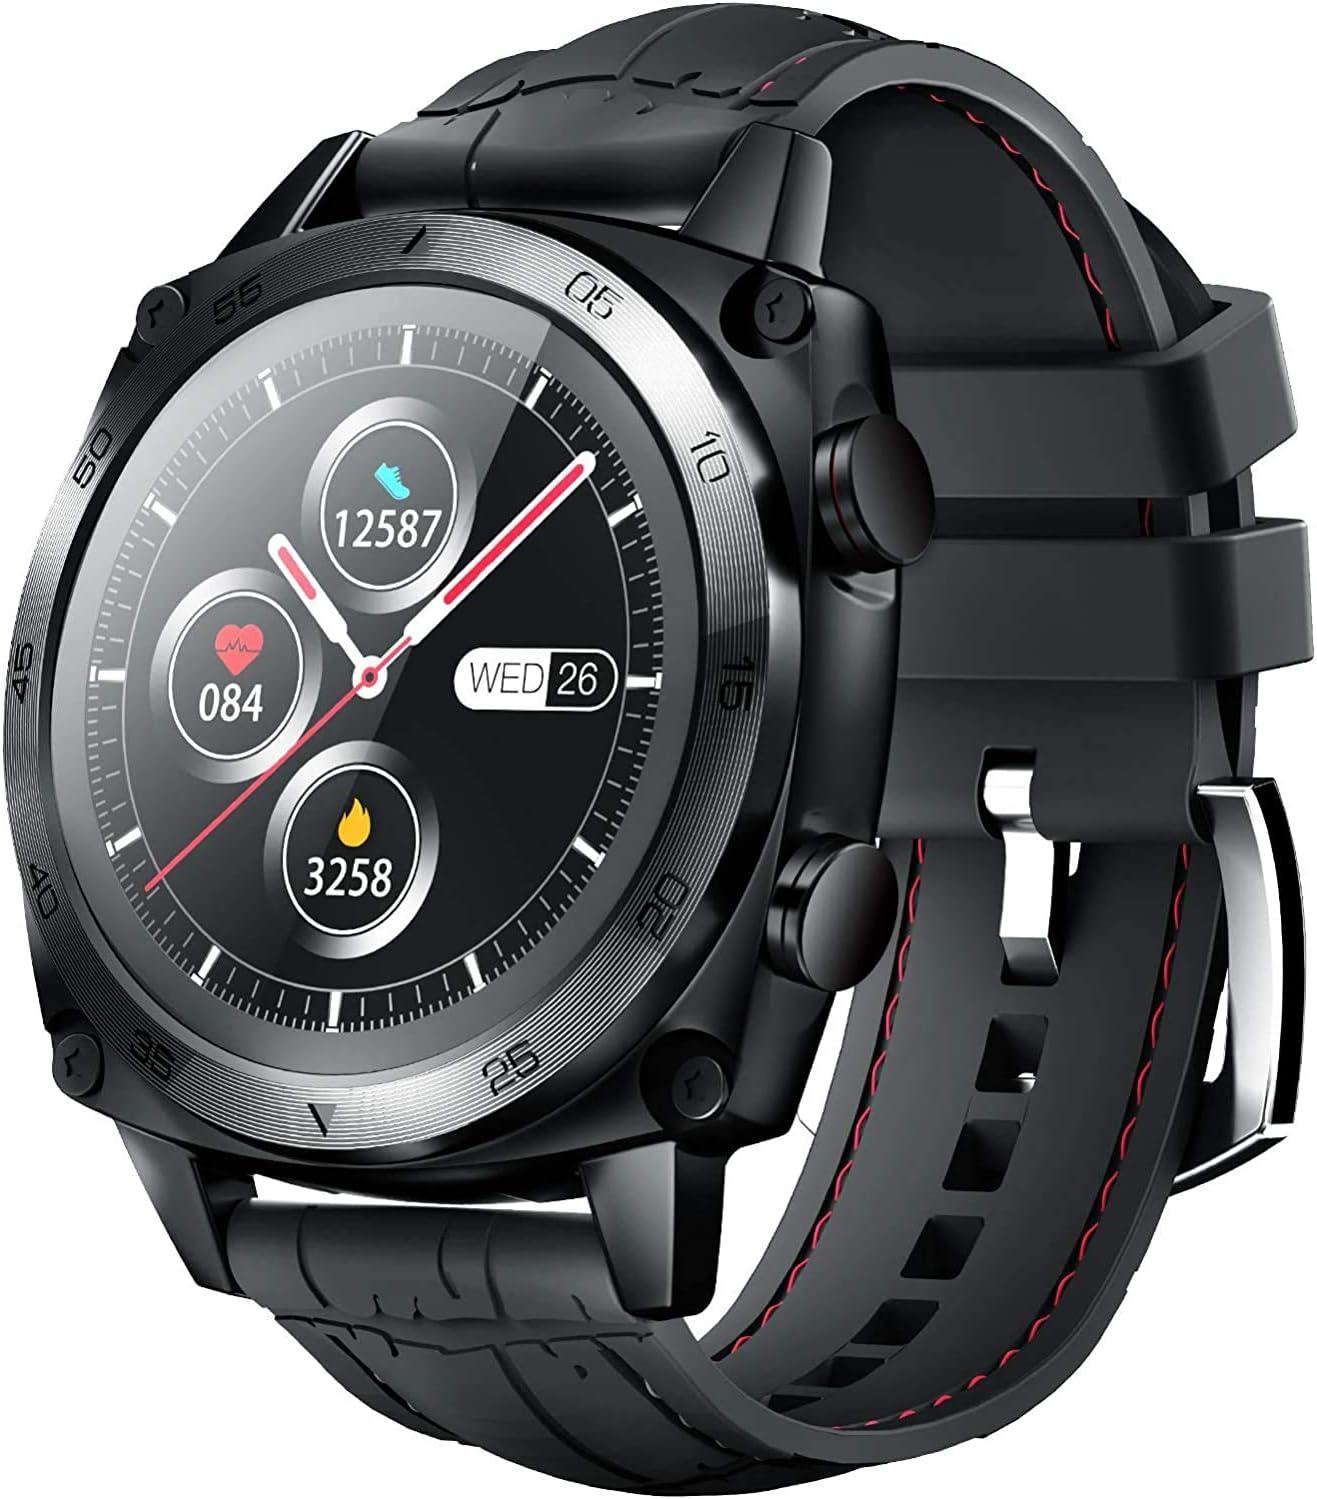 Smart Watch for Men Compatible online shop mart iPhone Samsung CUBOT C3 Wat IP68